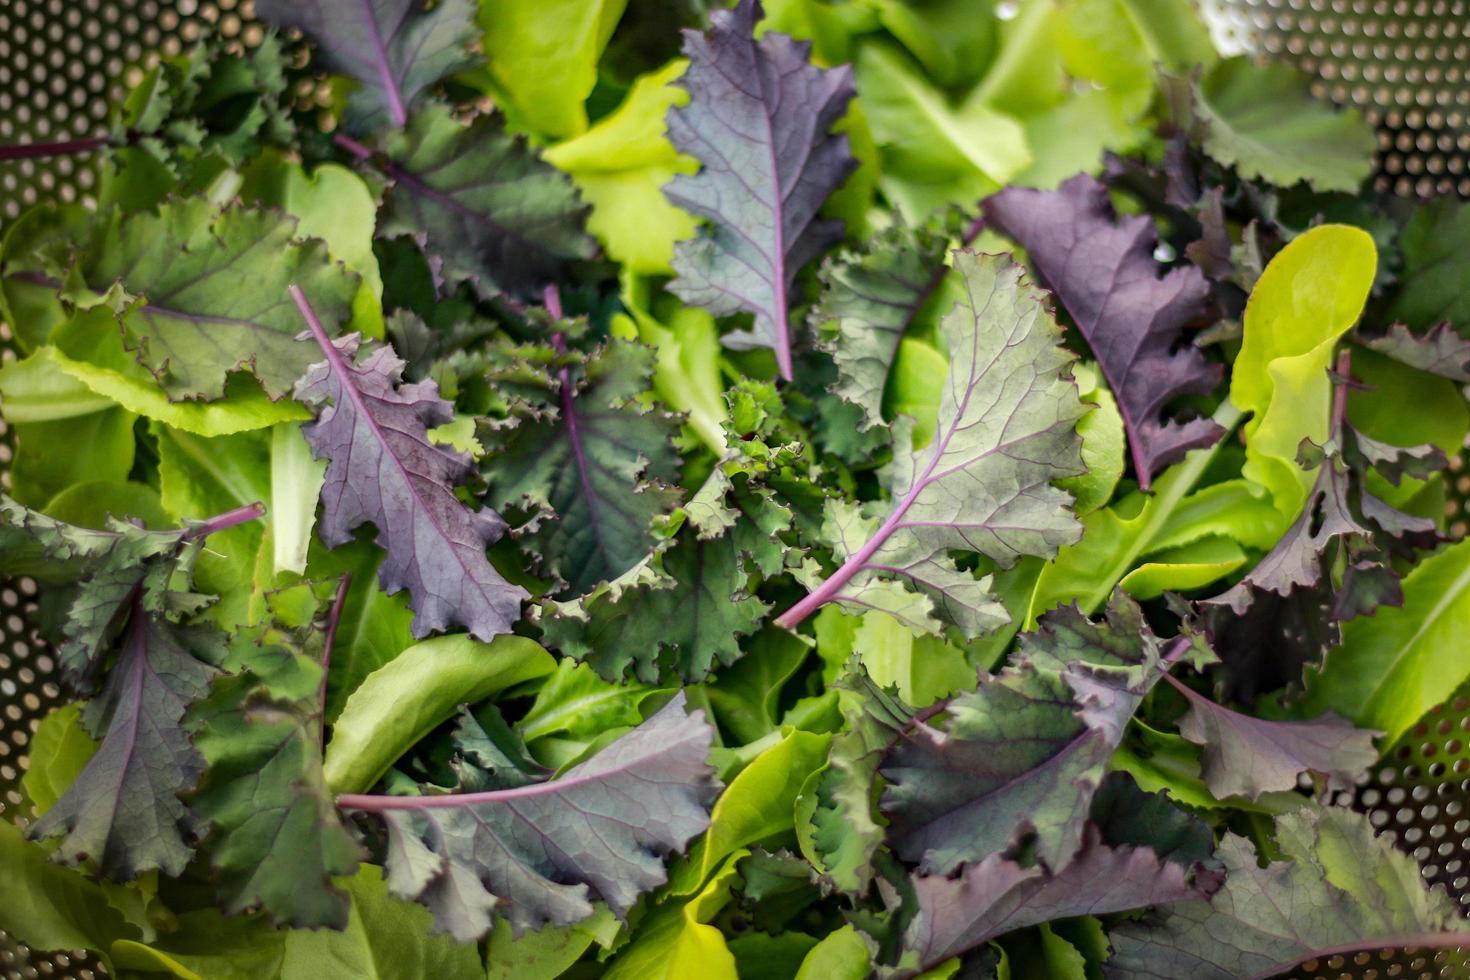 Fresh green lettuces photo